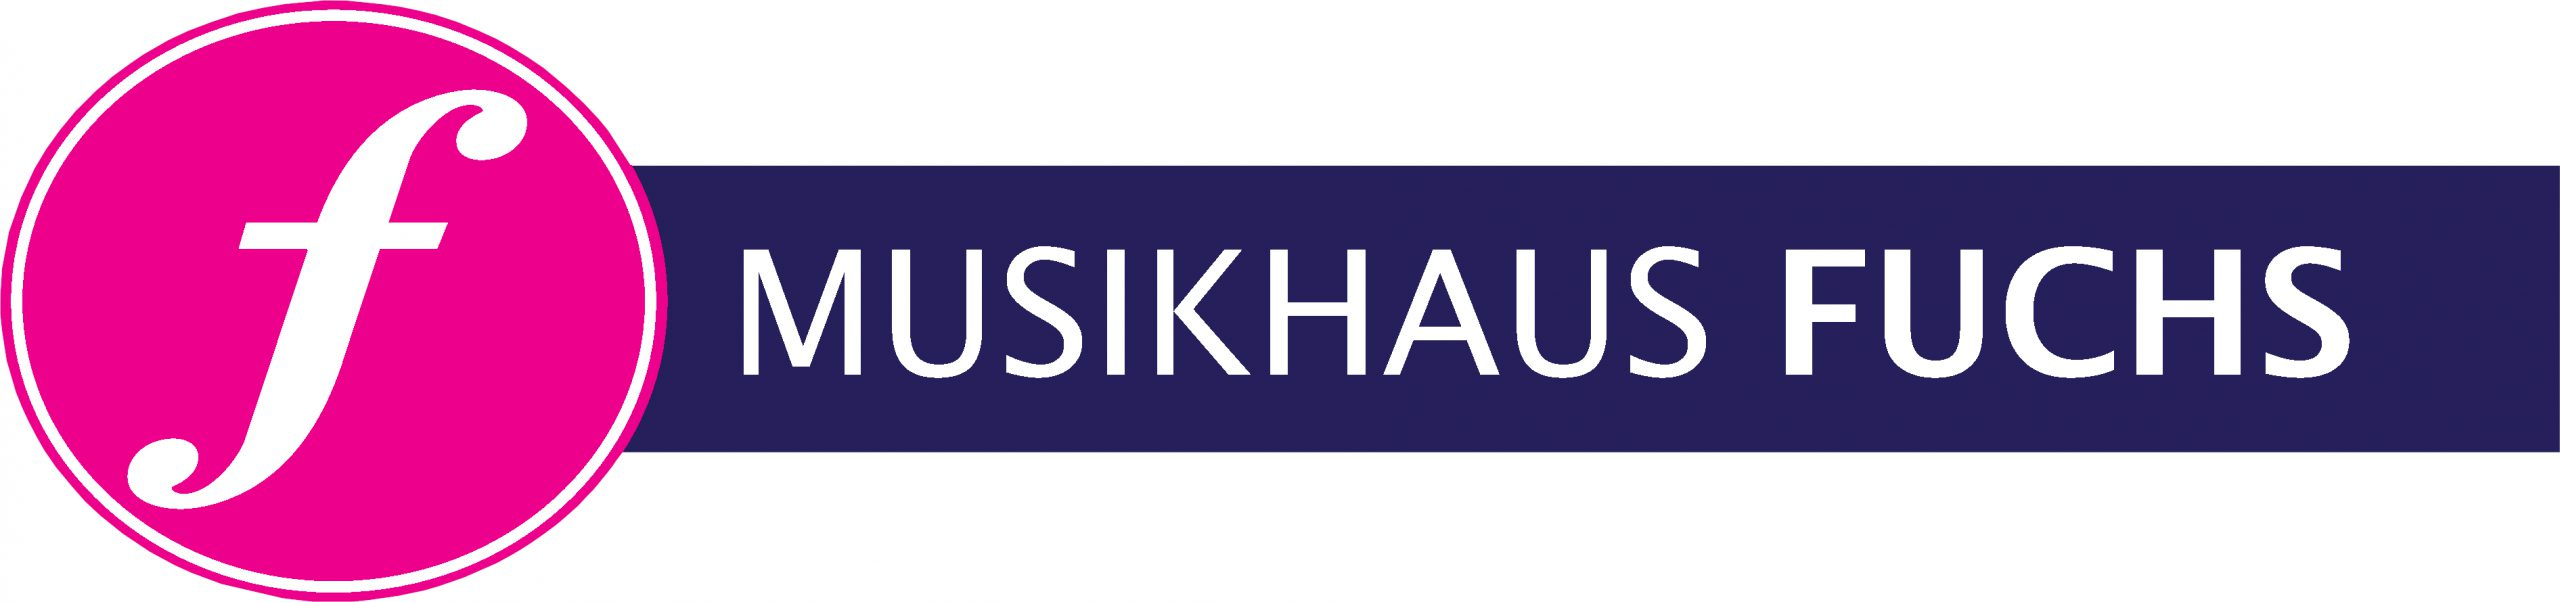 Musikhaus Fuchs